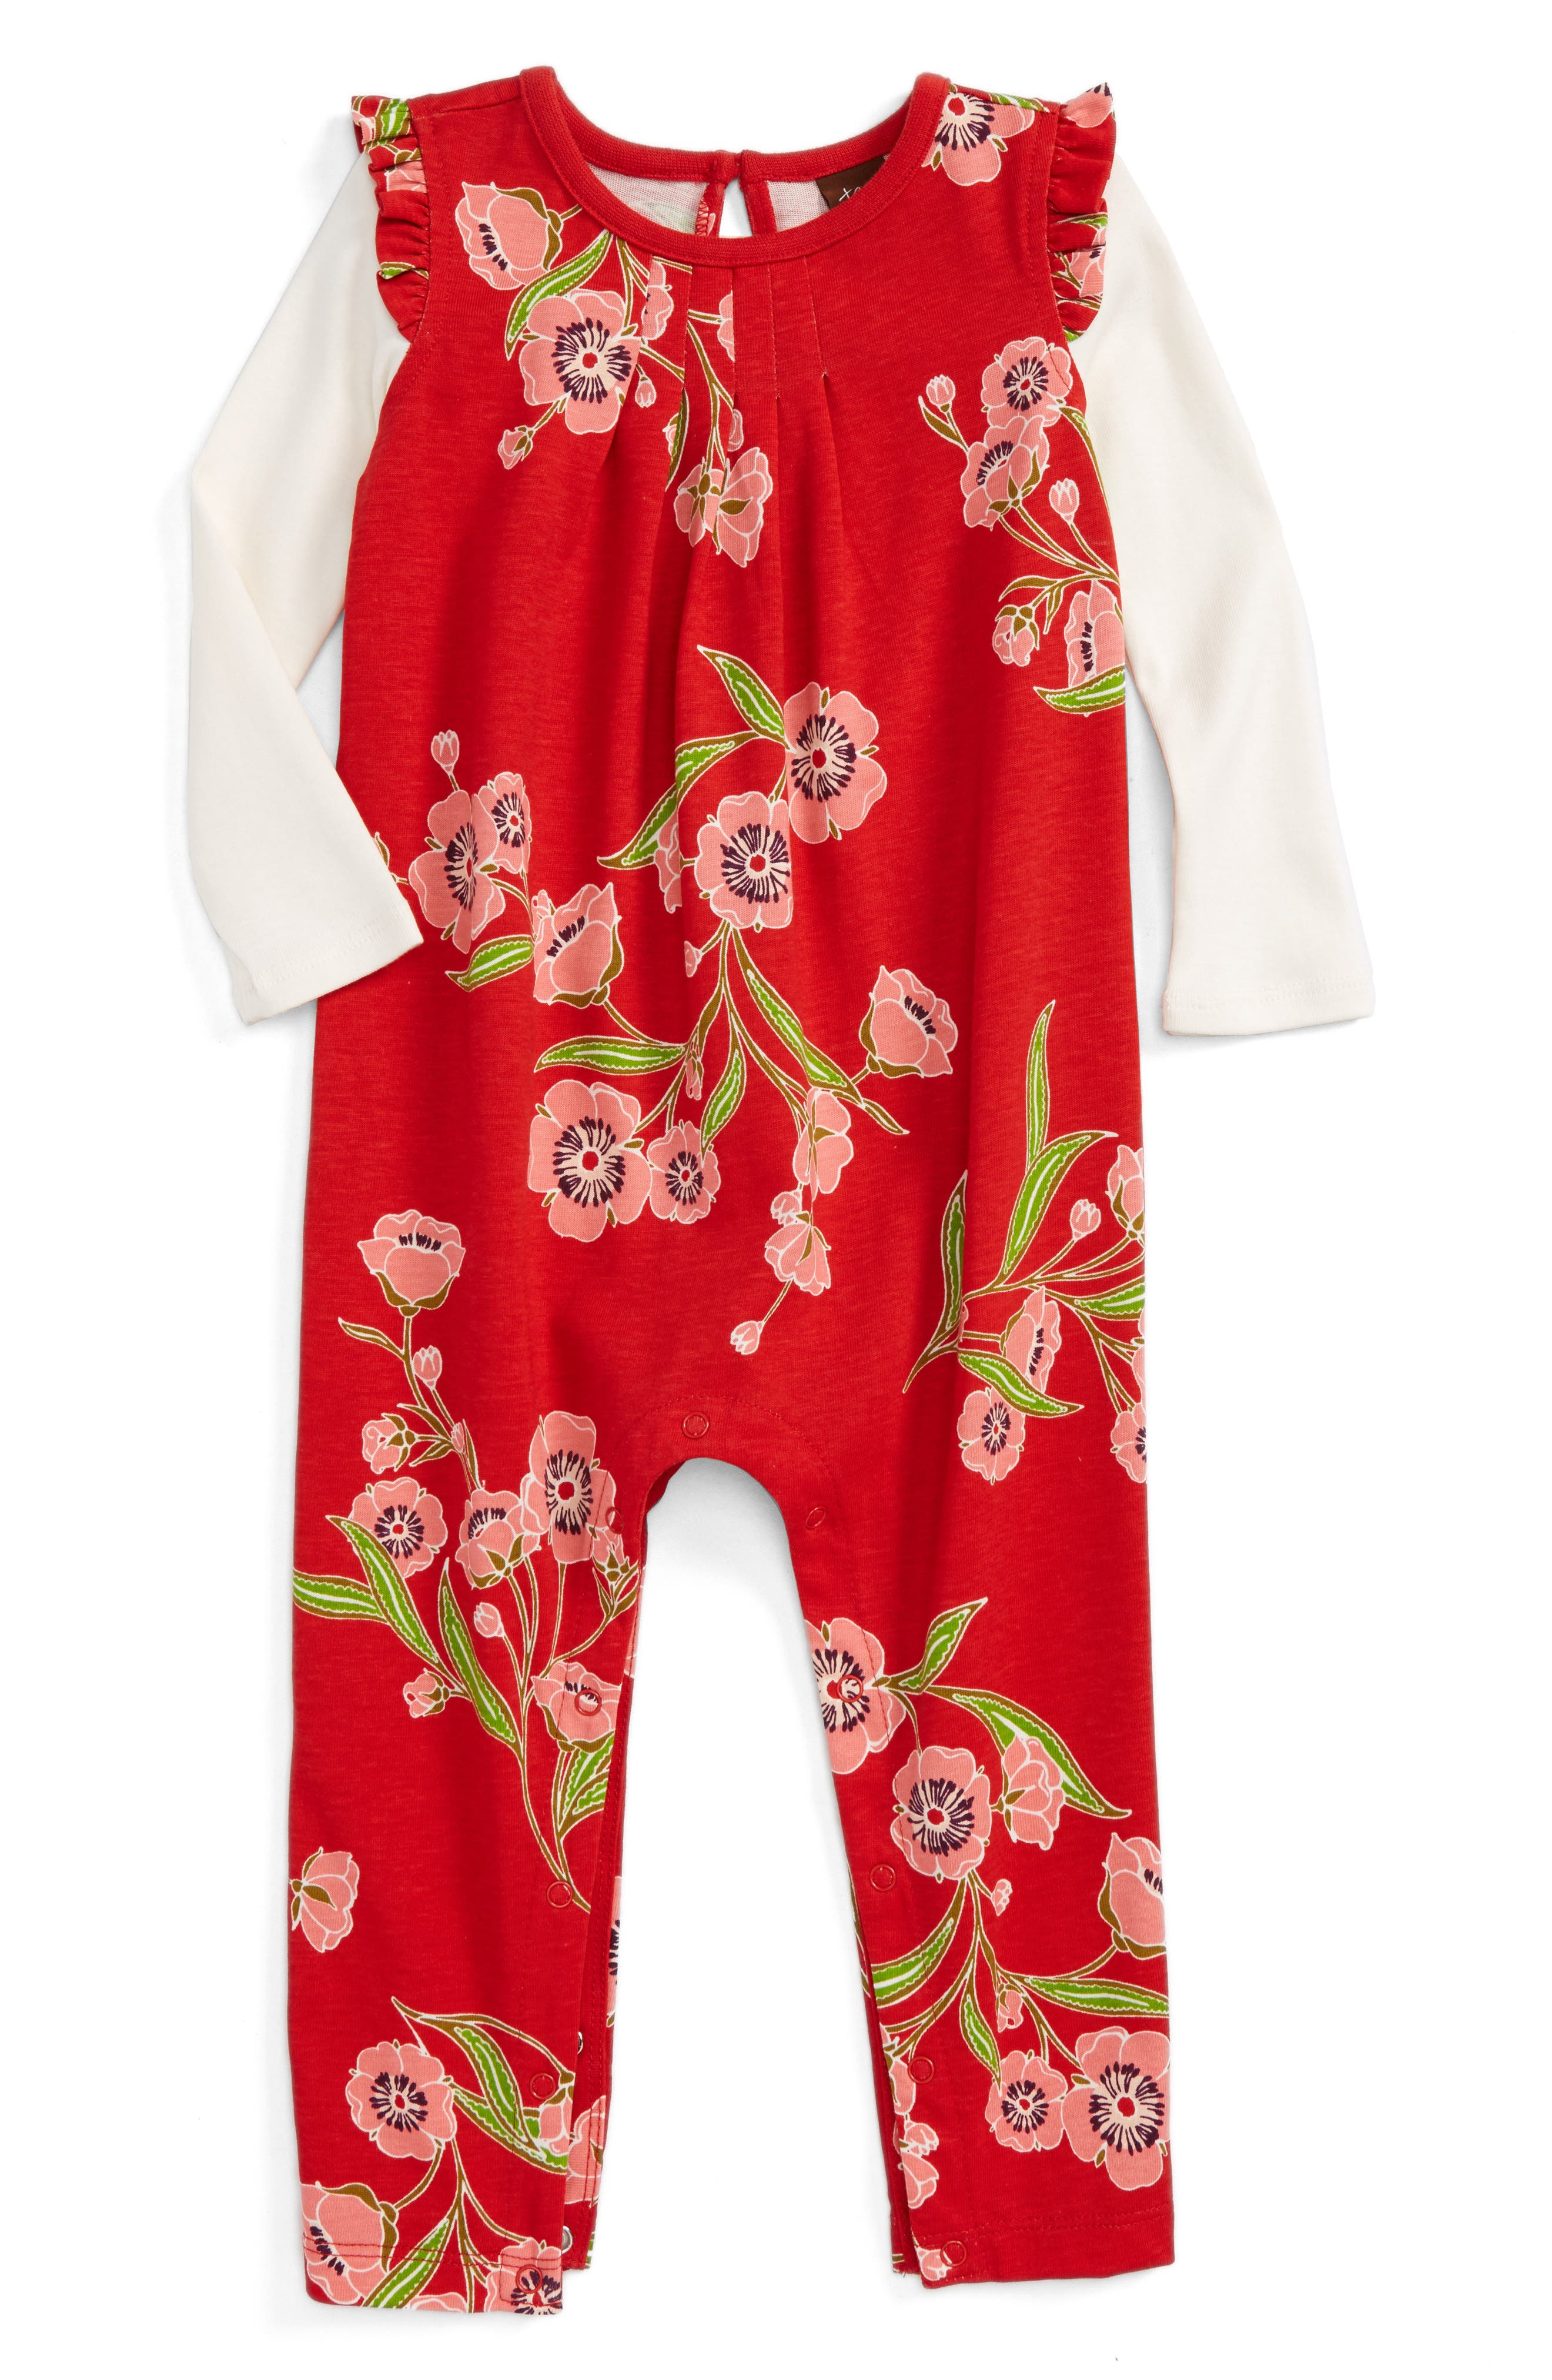 Main Image - Tea Collection Rowan Romper (Baby Girls)